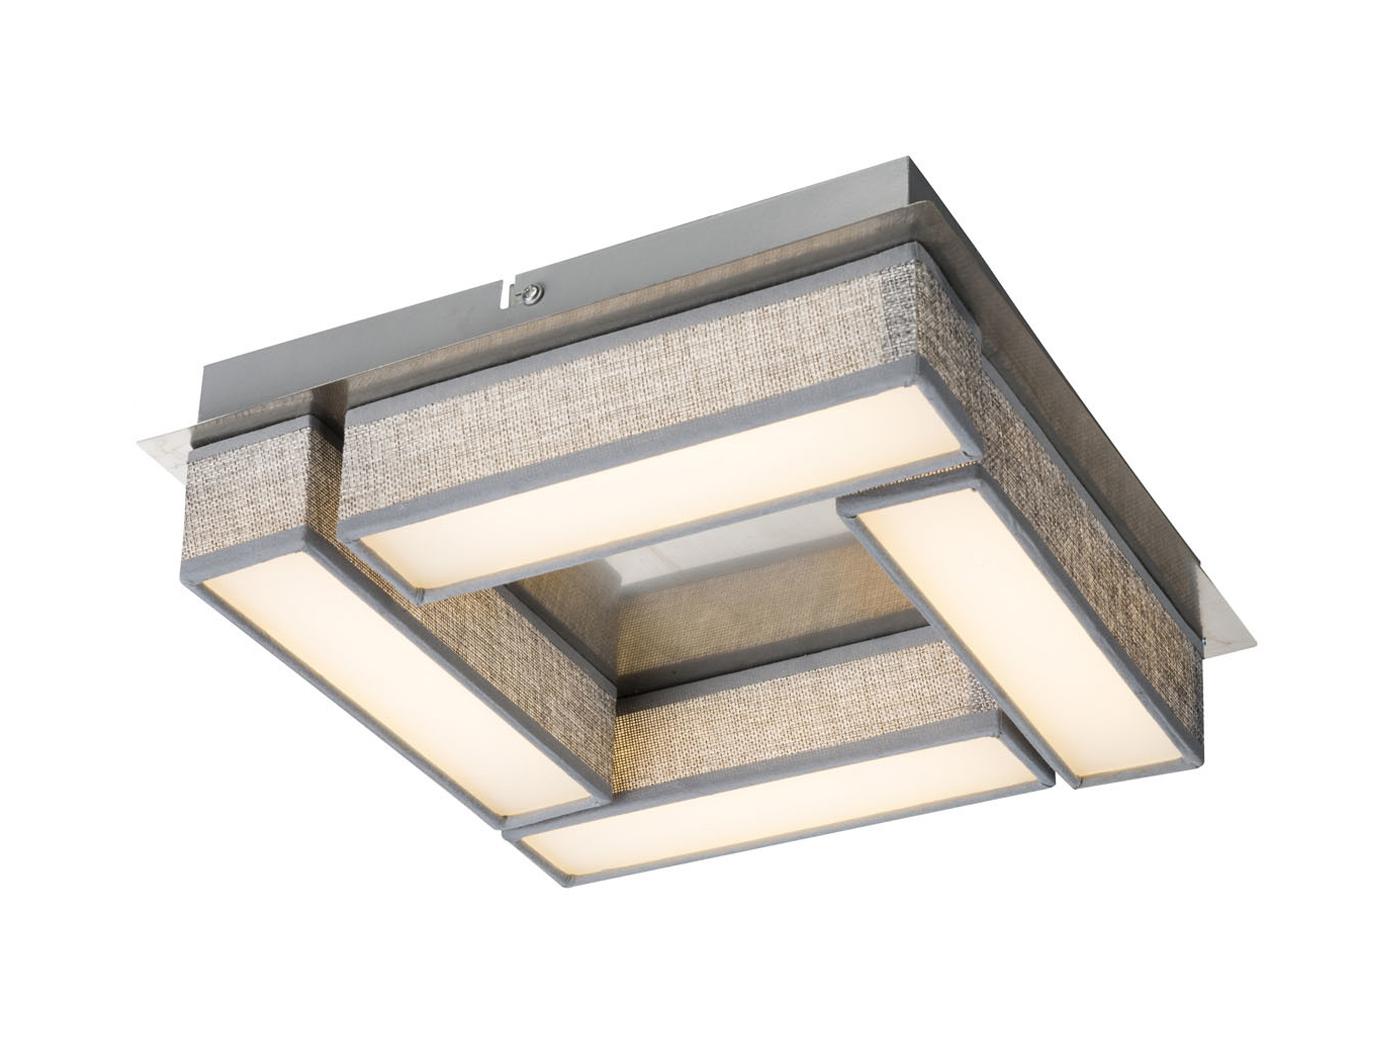 Globo LED Deckenleuchte 30x30 cm Textil grau, Deckenlampe modern ...